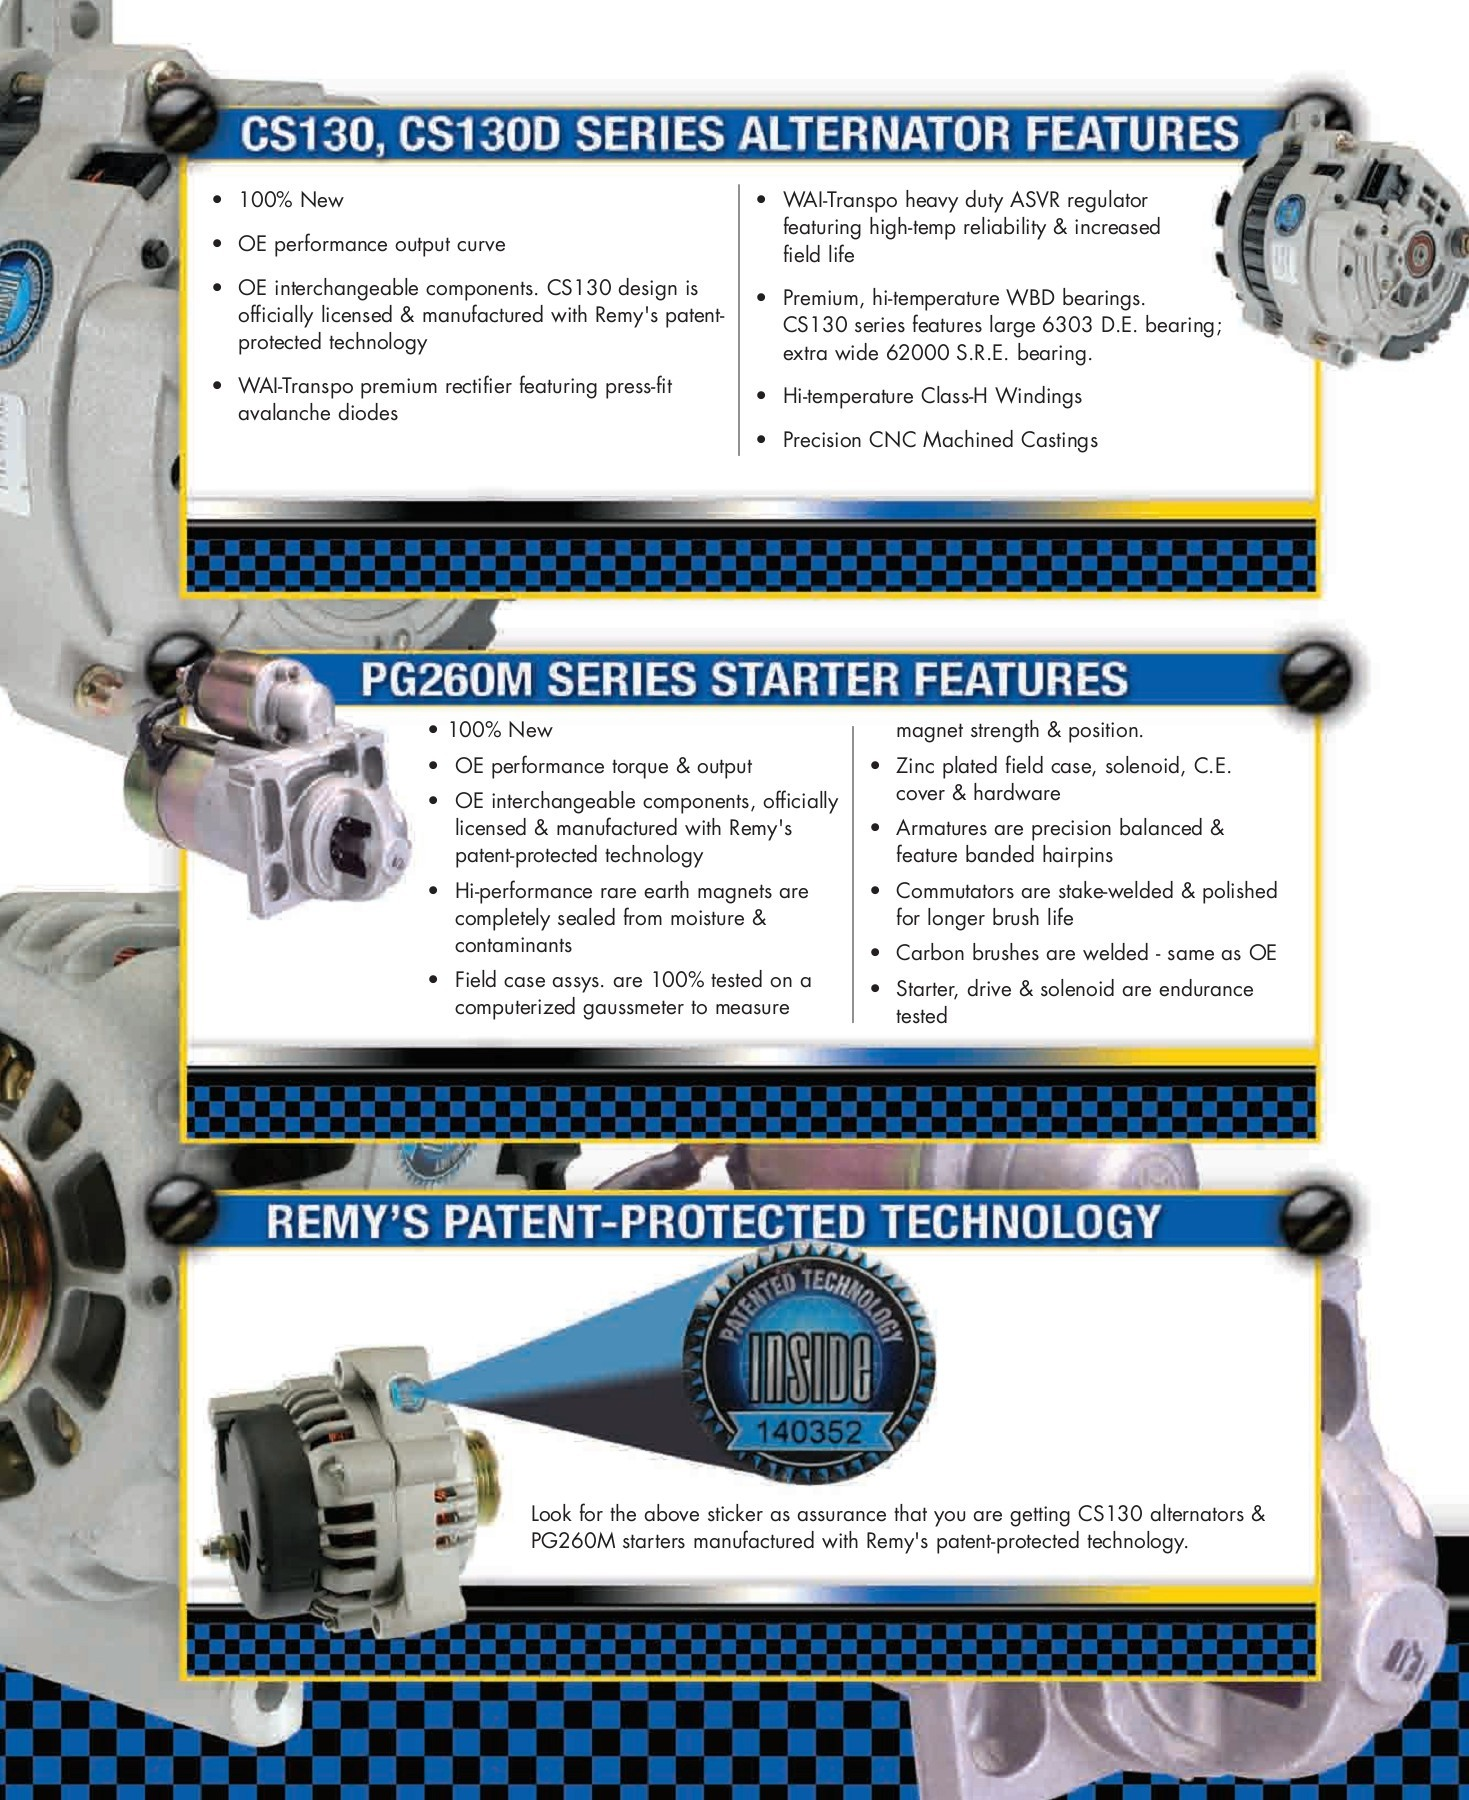 hight resolution of alternators starters generators motors domestic import pages 1 50 text version fliphtml5